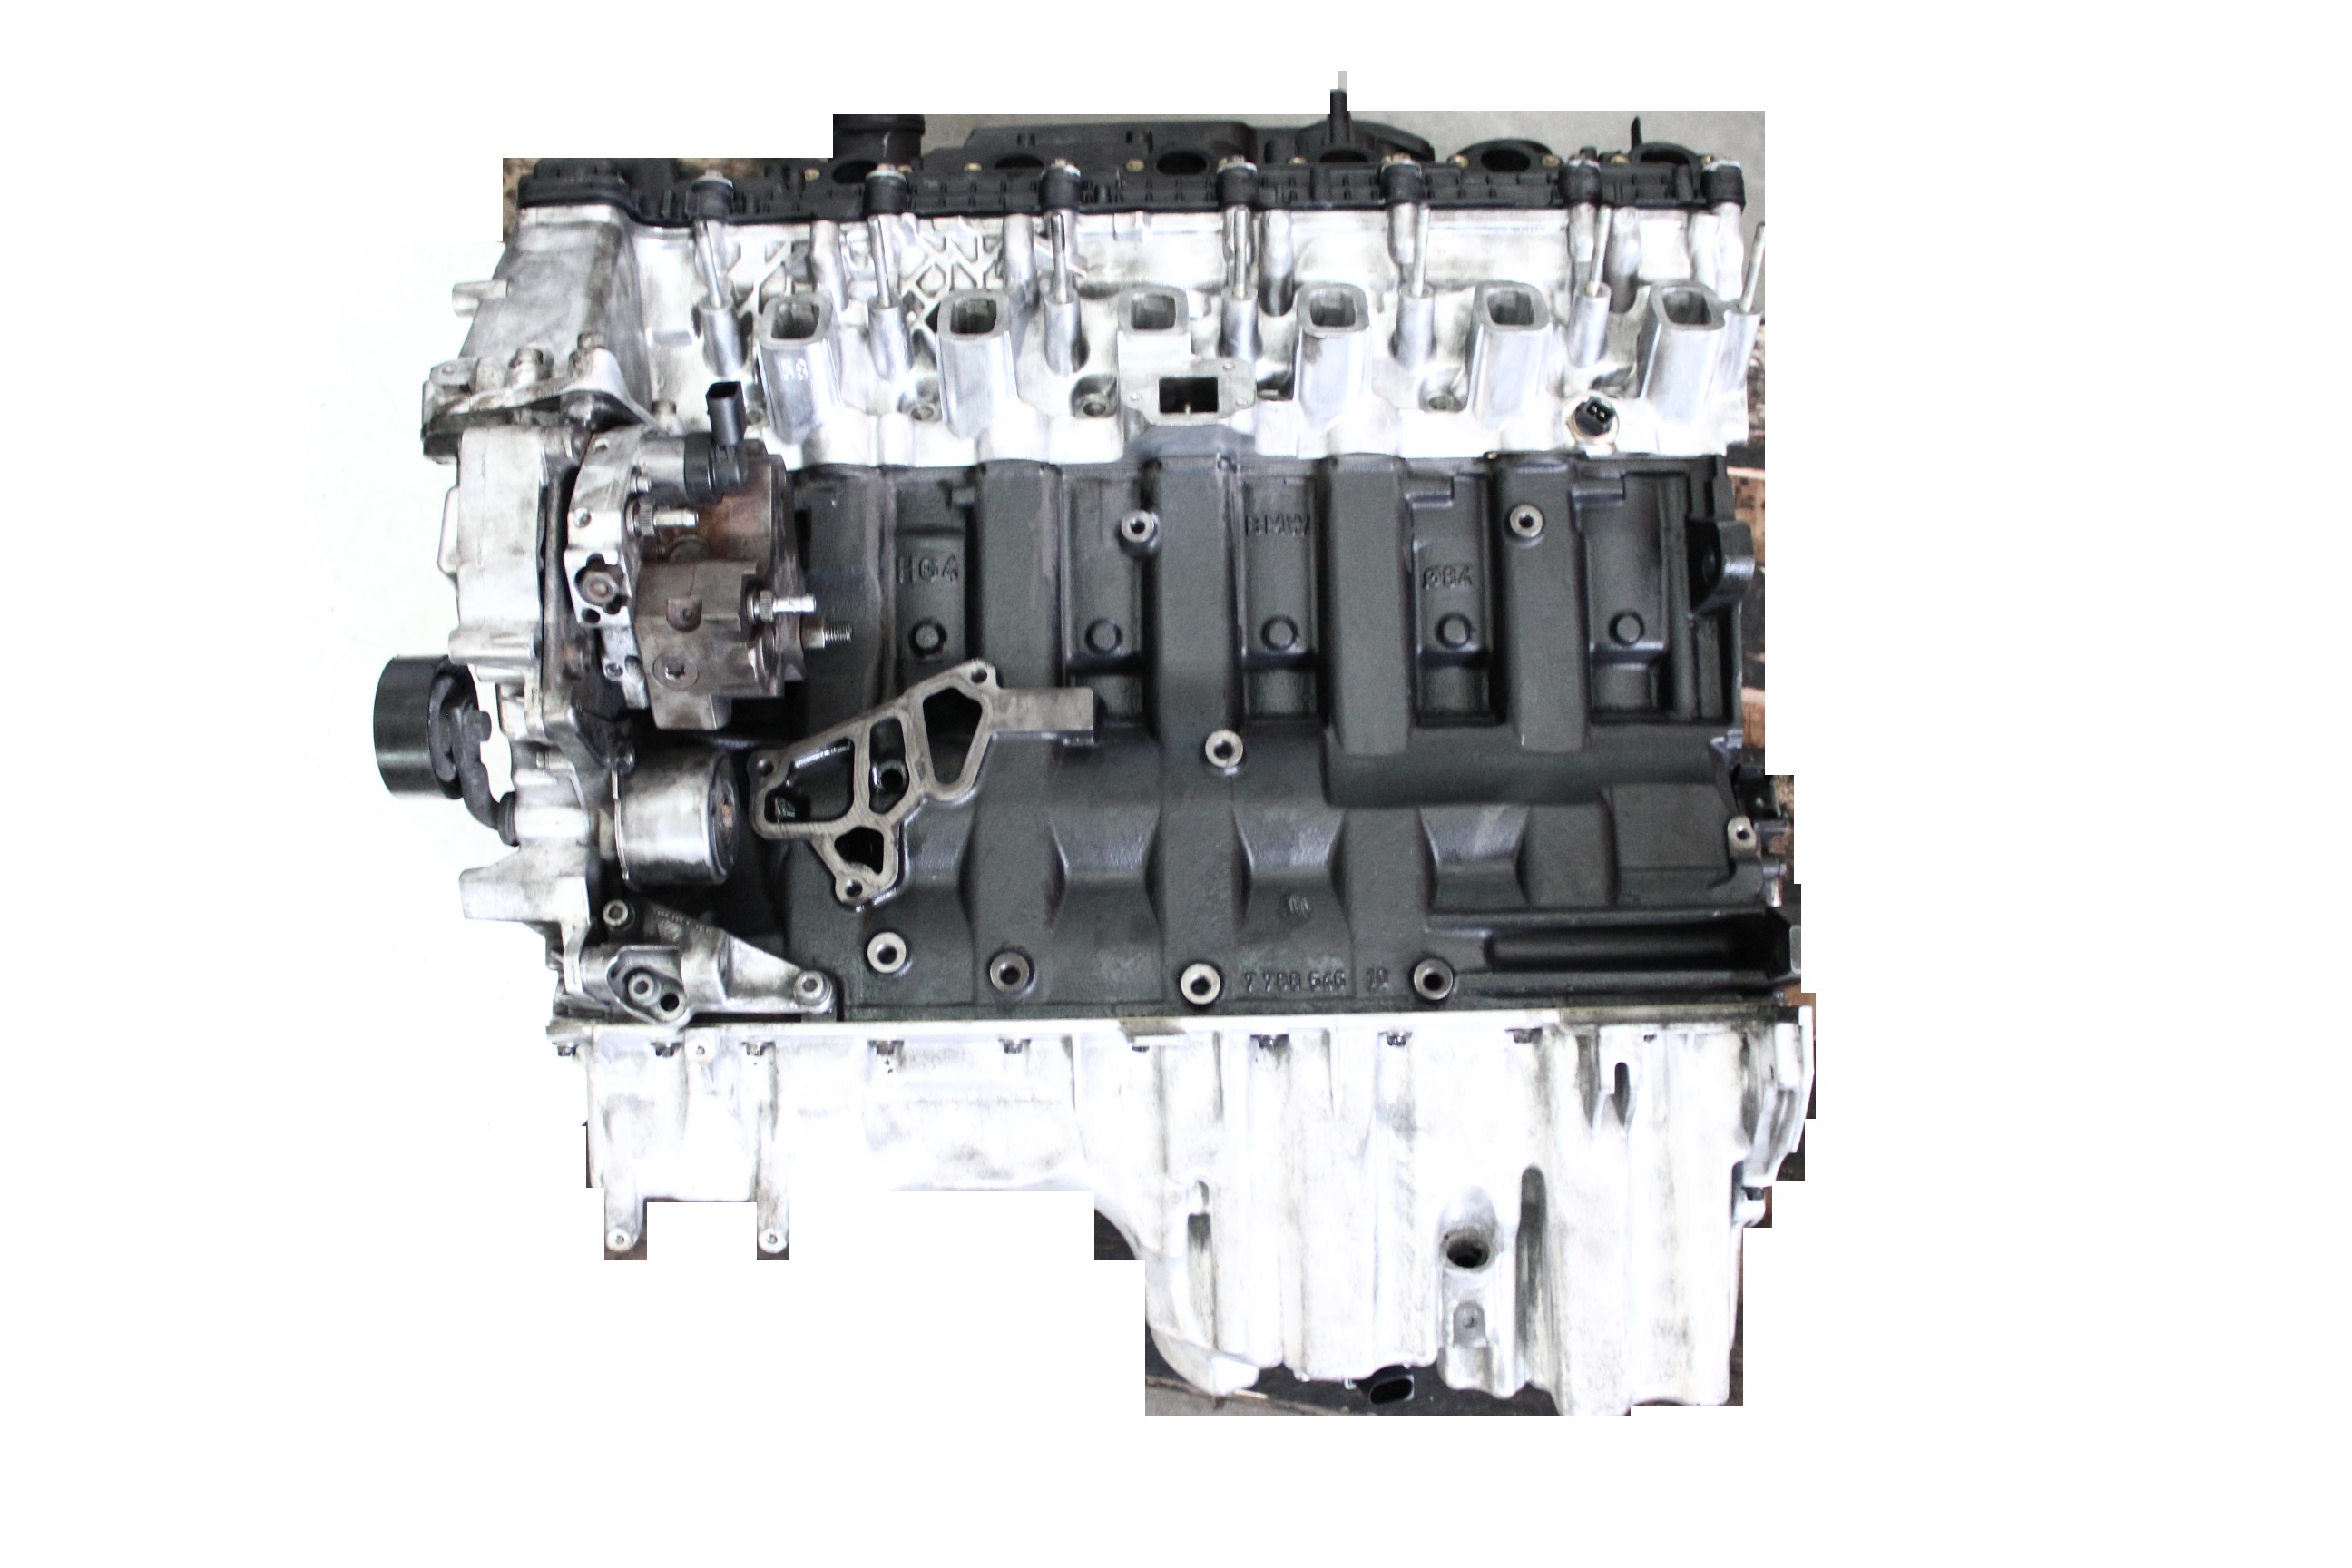 Motor BMW 2,5 Diesel D M57 M57D25 256D2 Zylinderkopf geplant